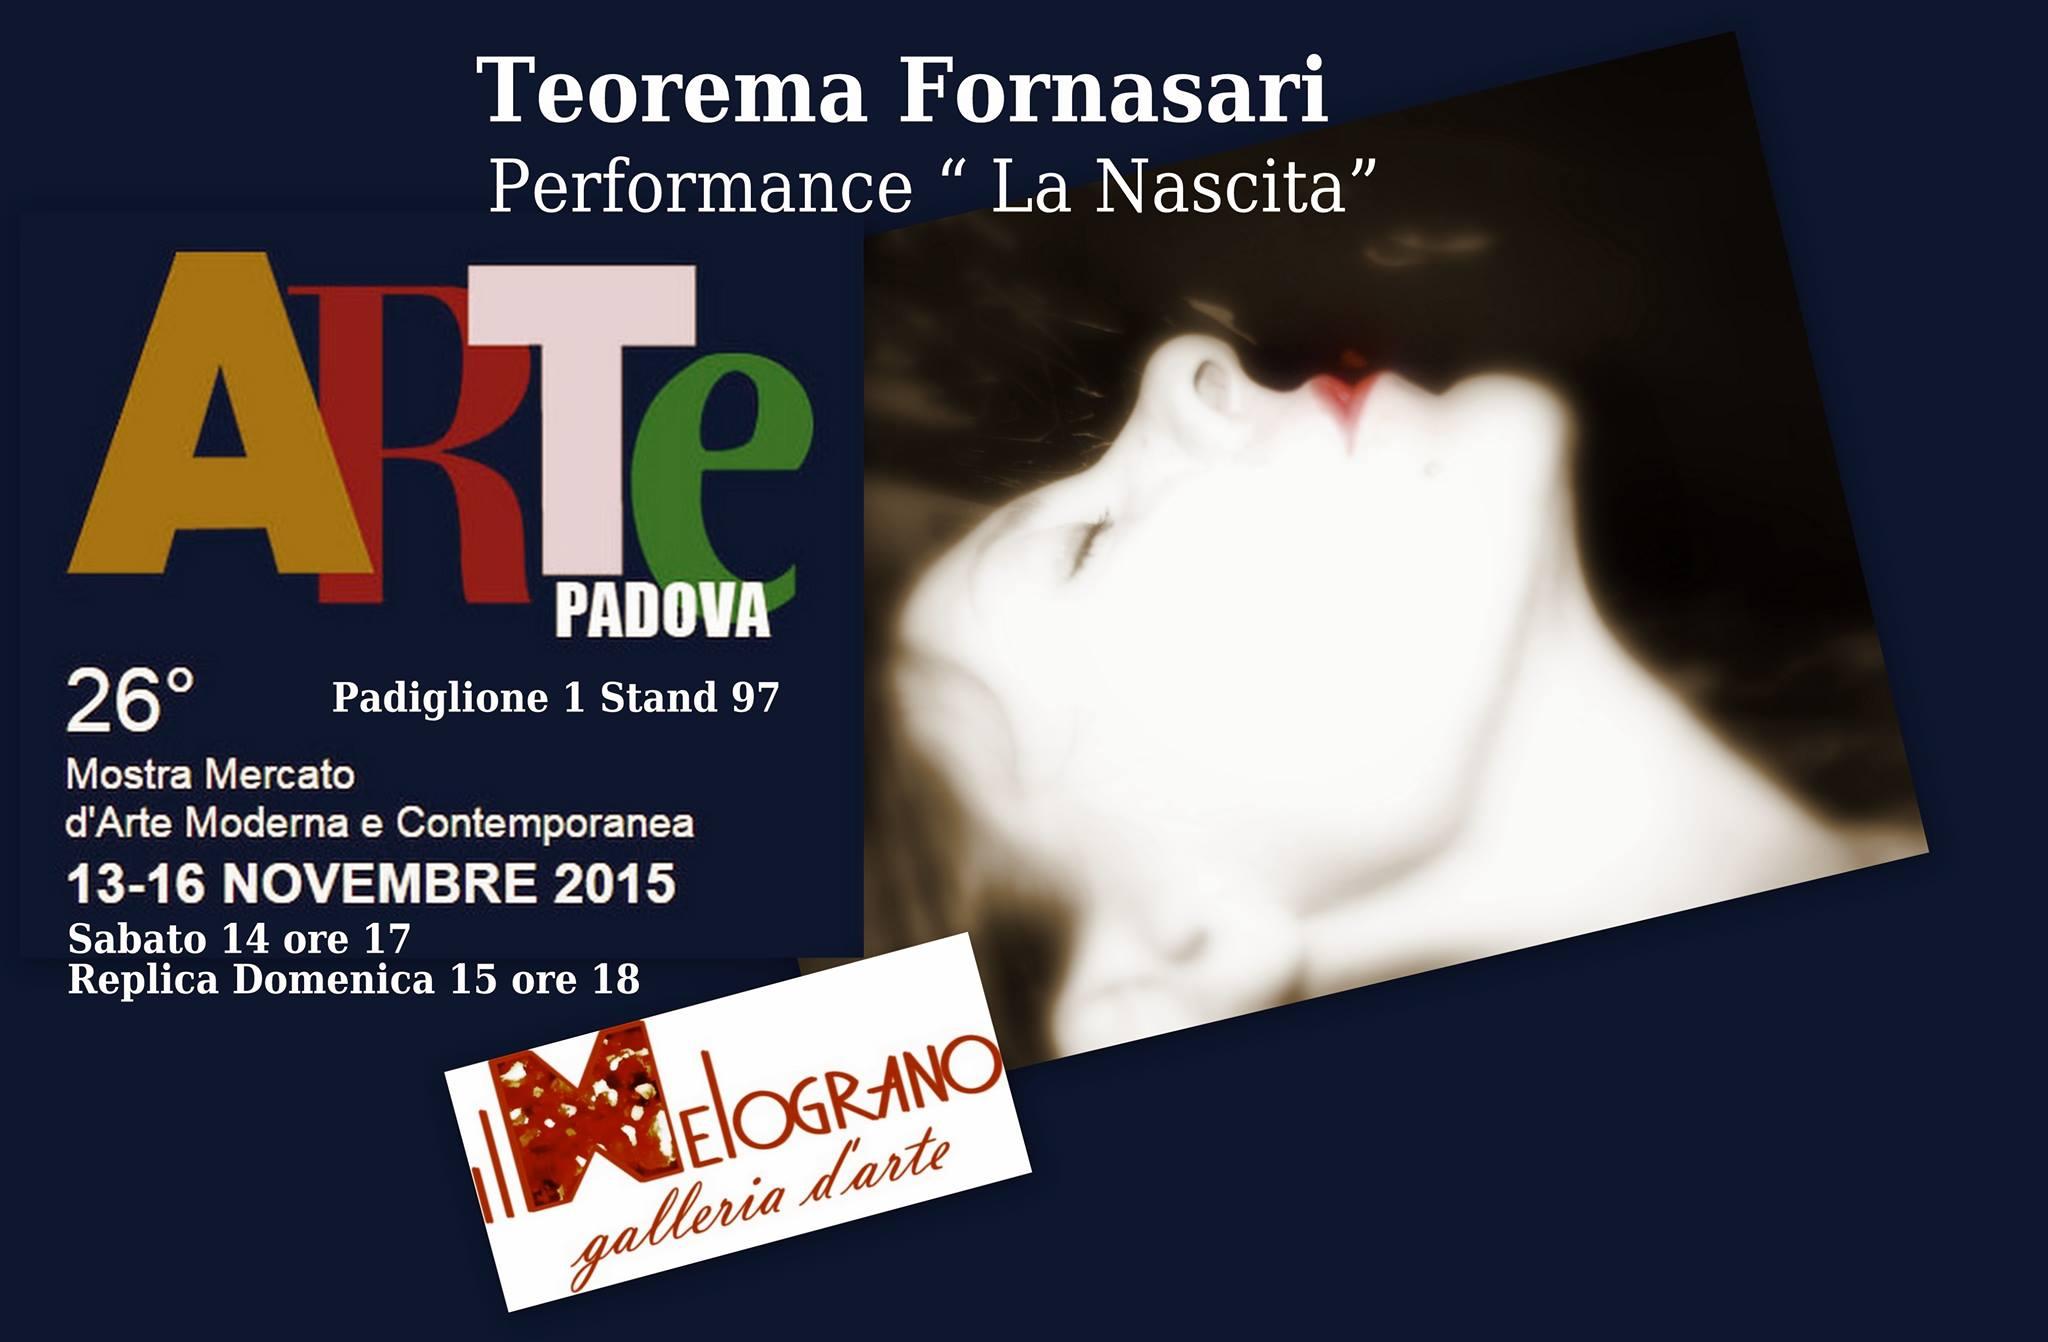 ArtePadova 2015 Teorema Fornasari